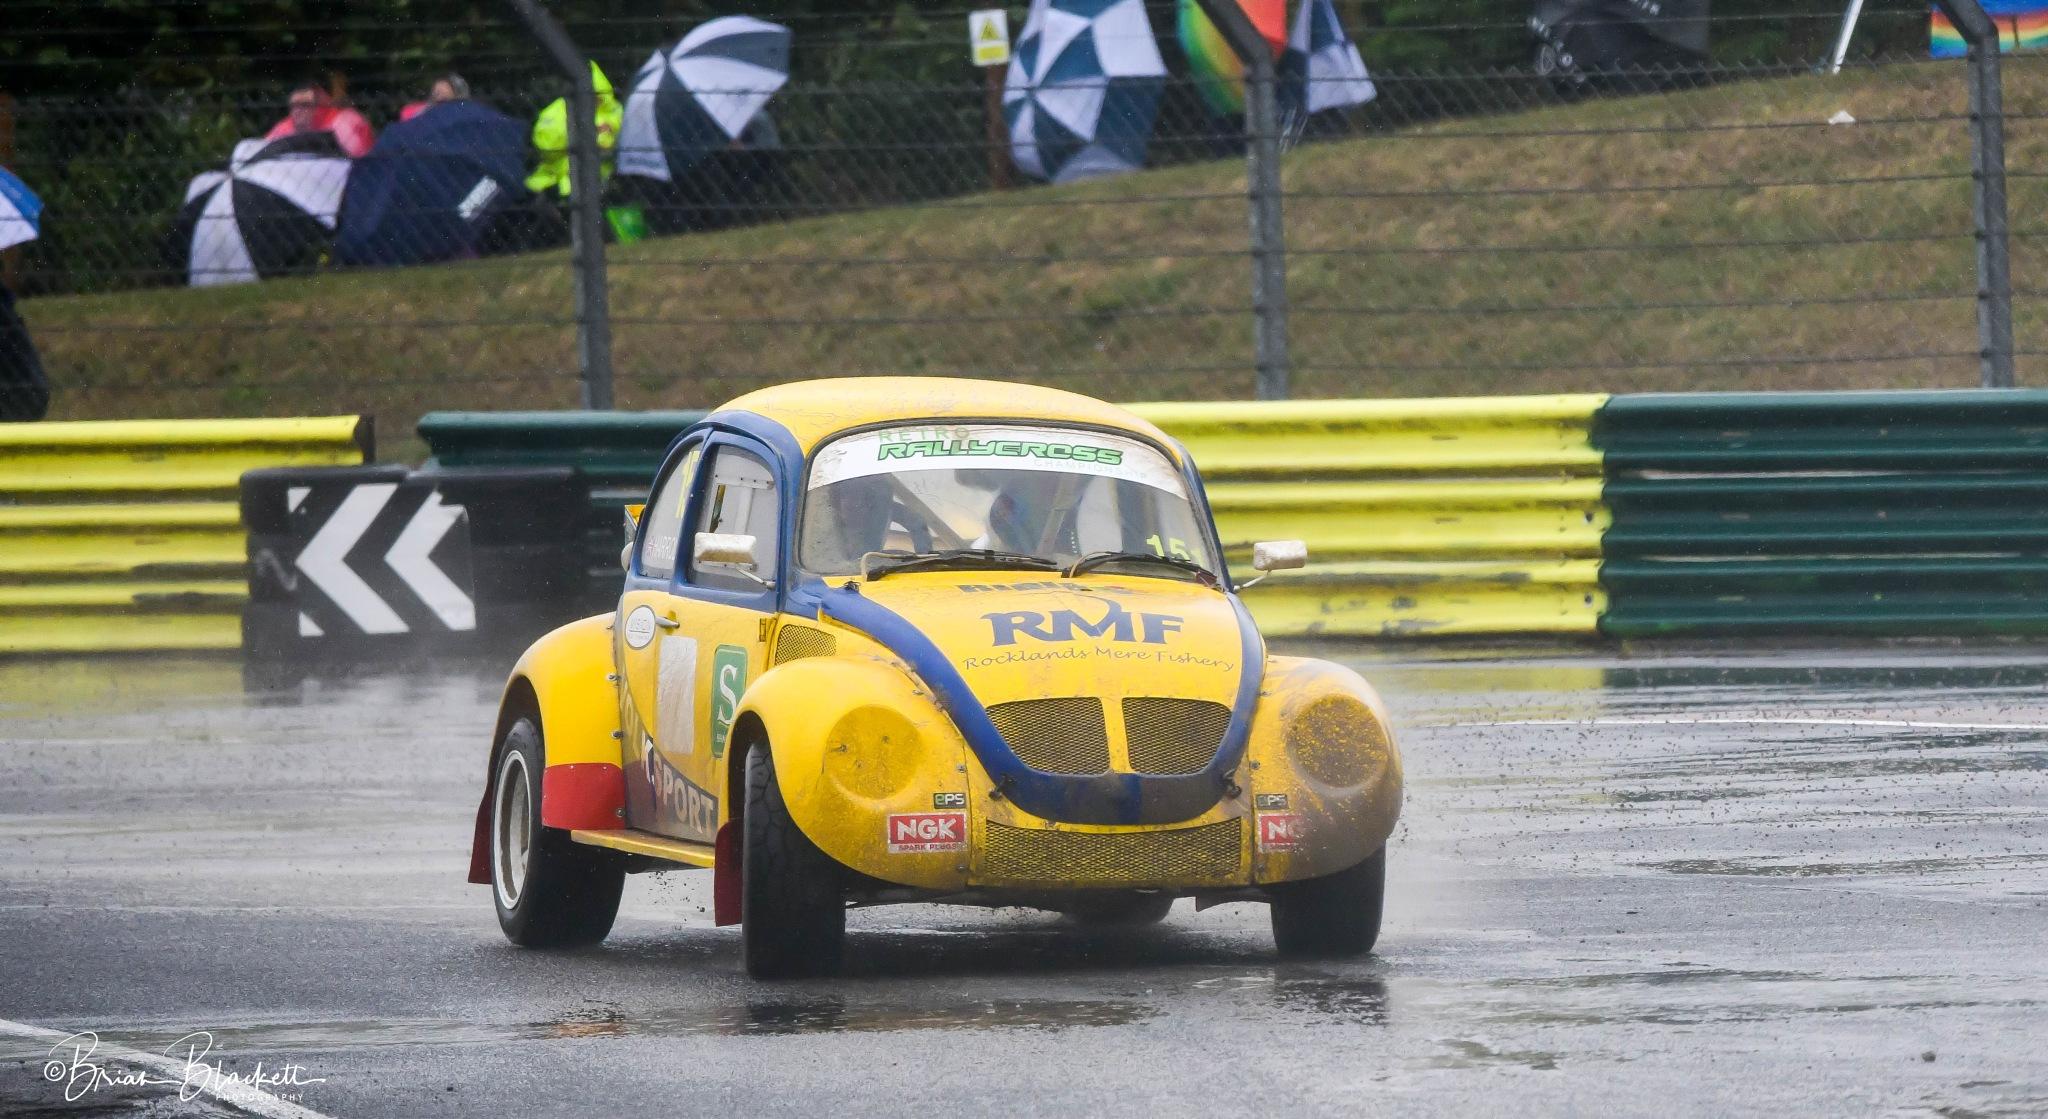 British Rally X Championships Croft Circuit July 2018. by brianblackett